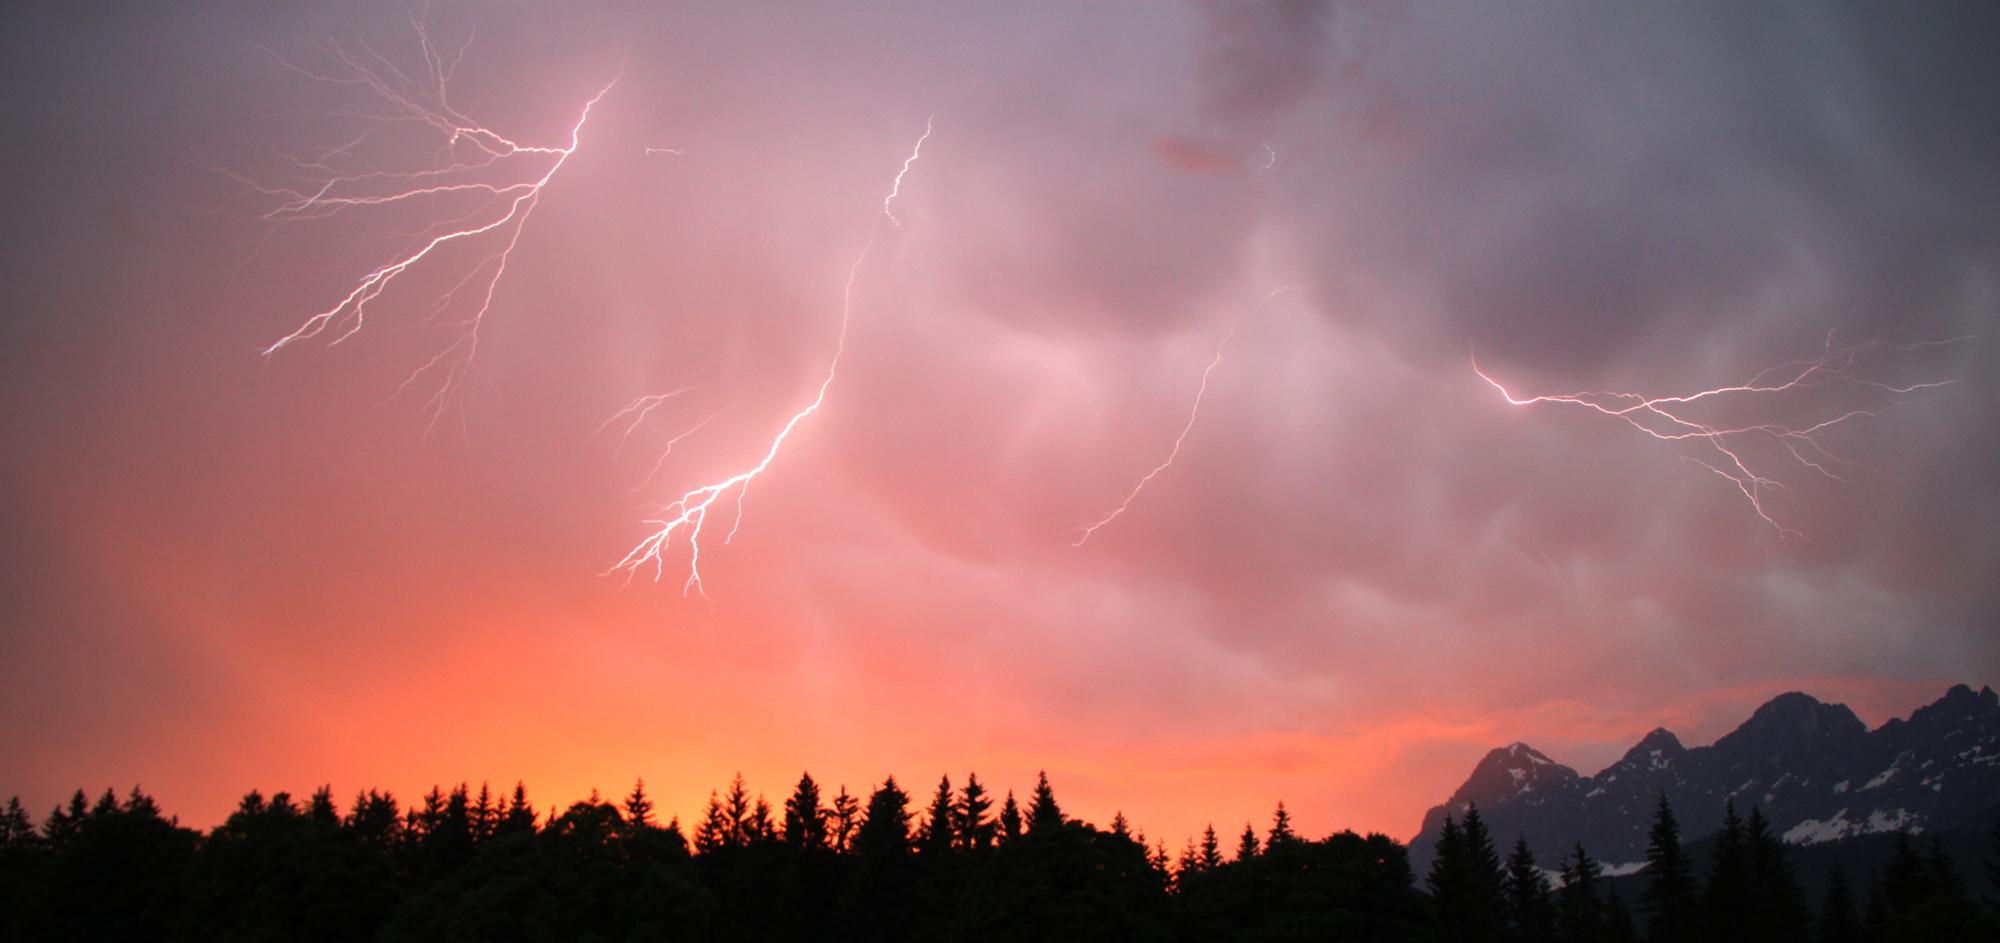 Sunset - Lightning